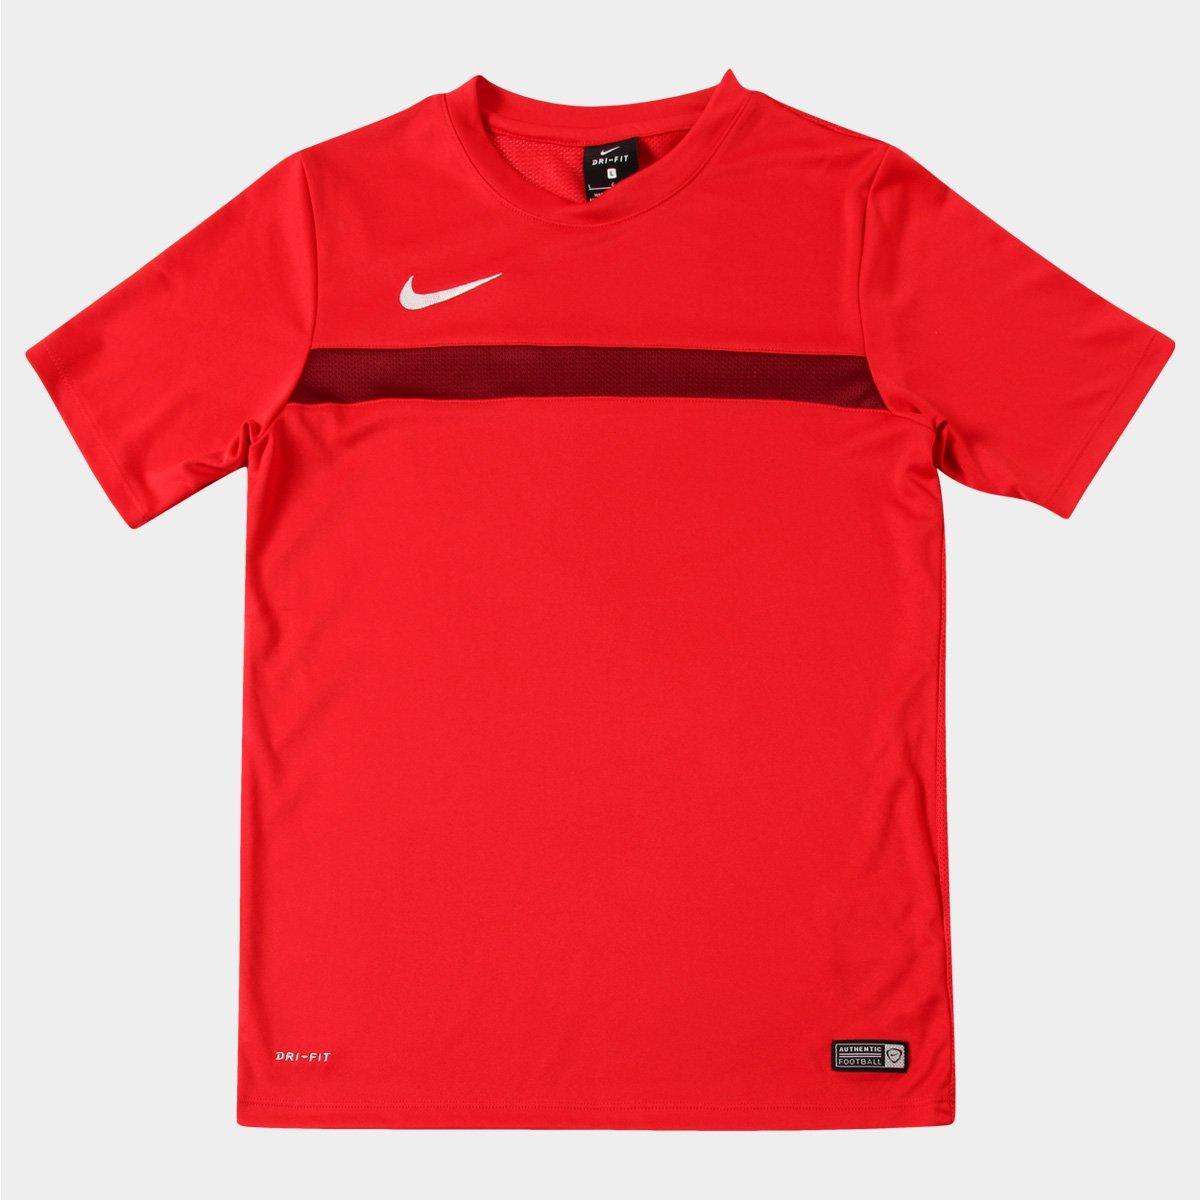 2d5f86ede0 Camisa Nike Academy Training Infantil - Vermelho+Branco